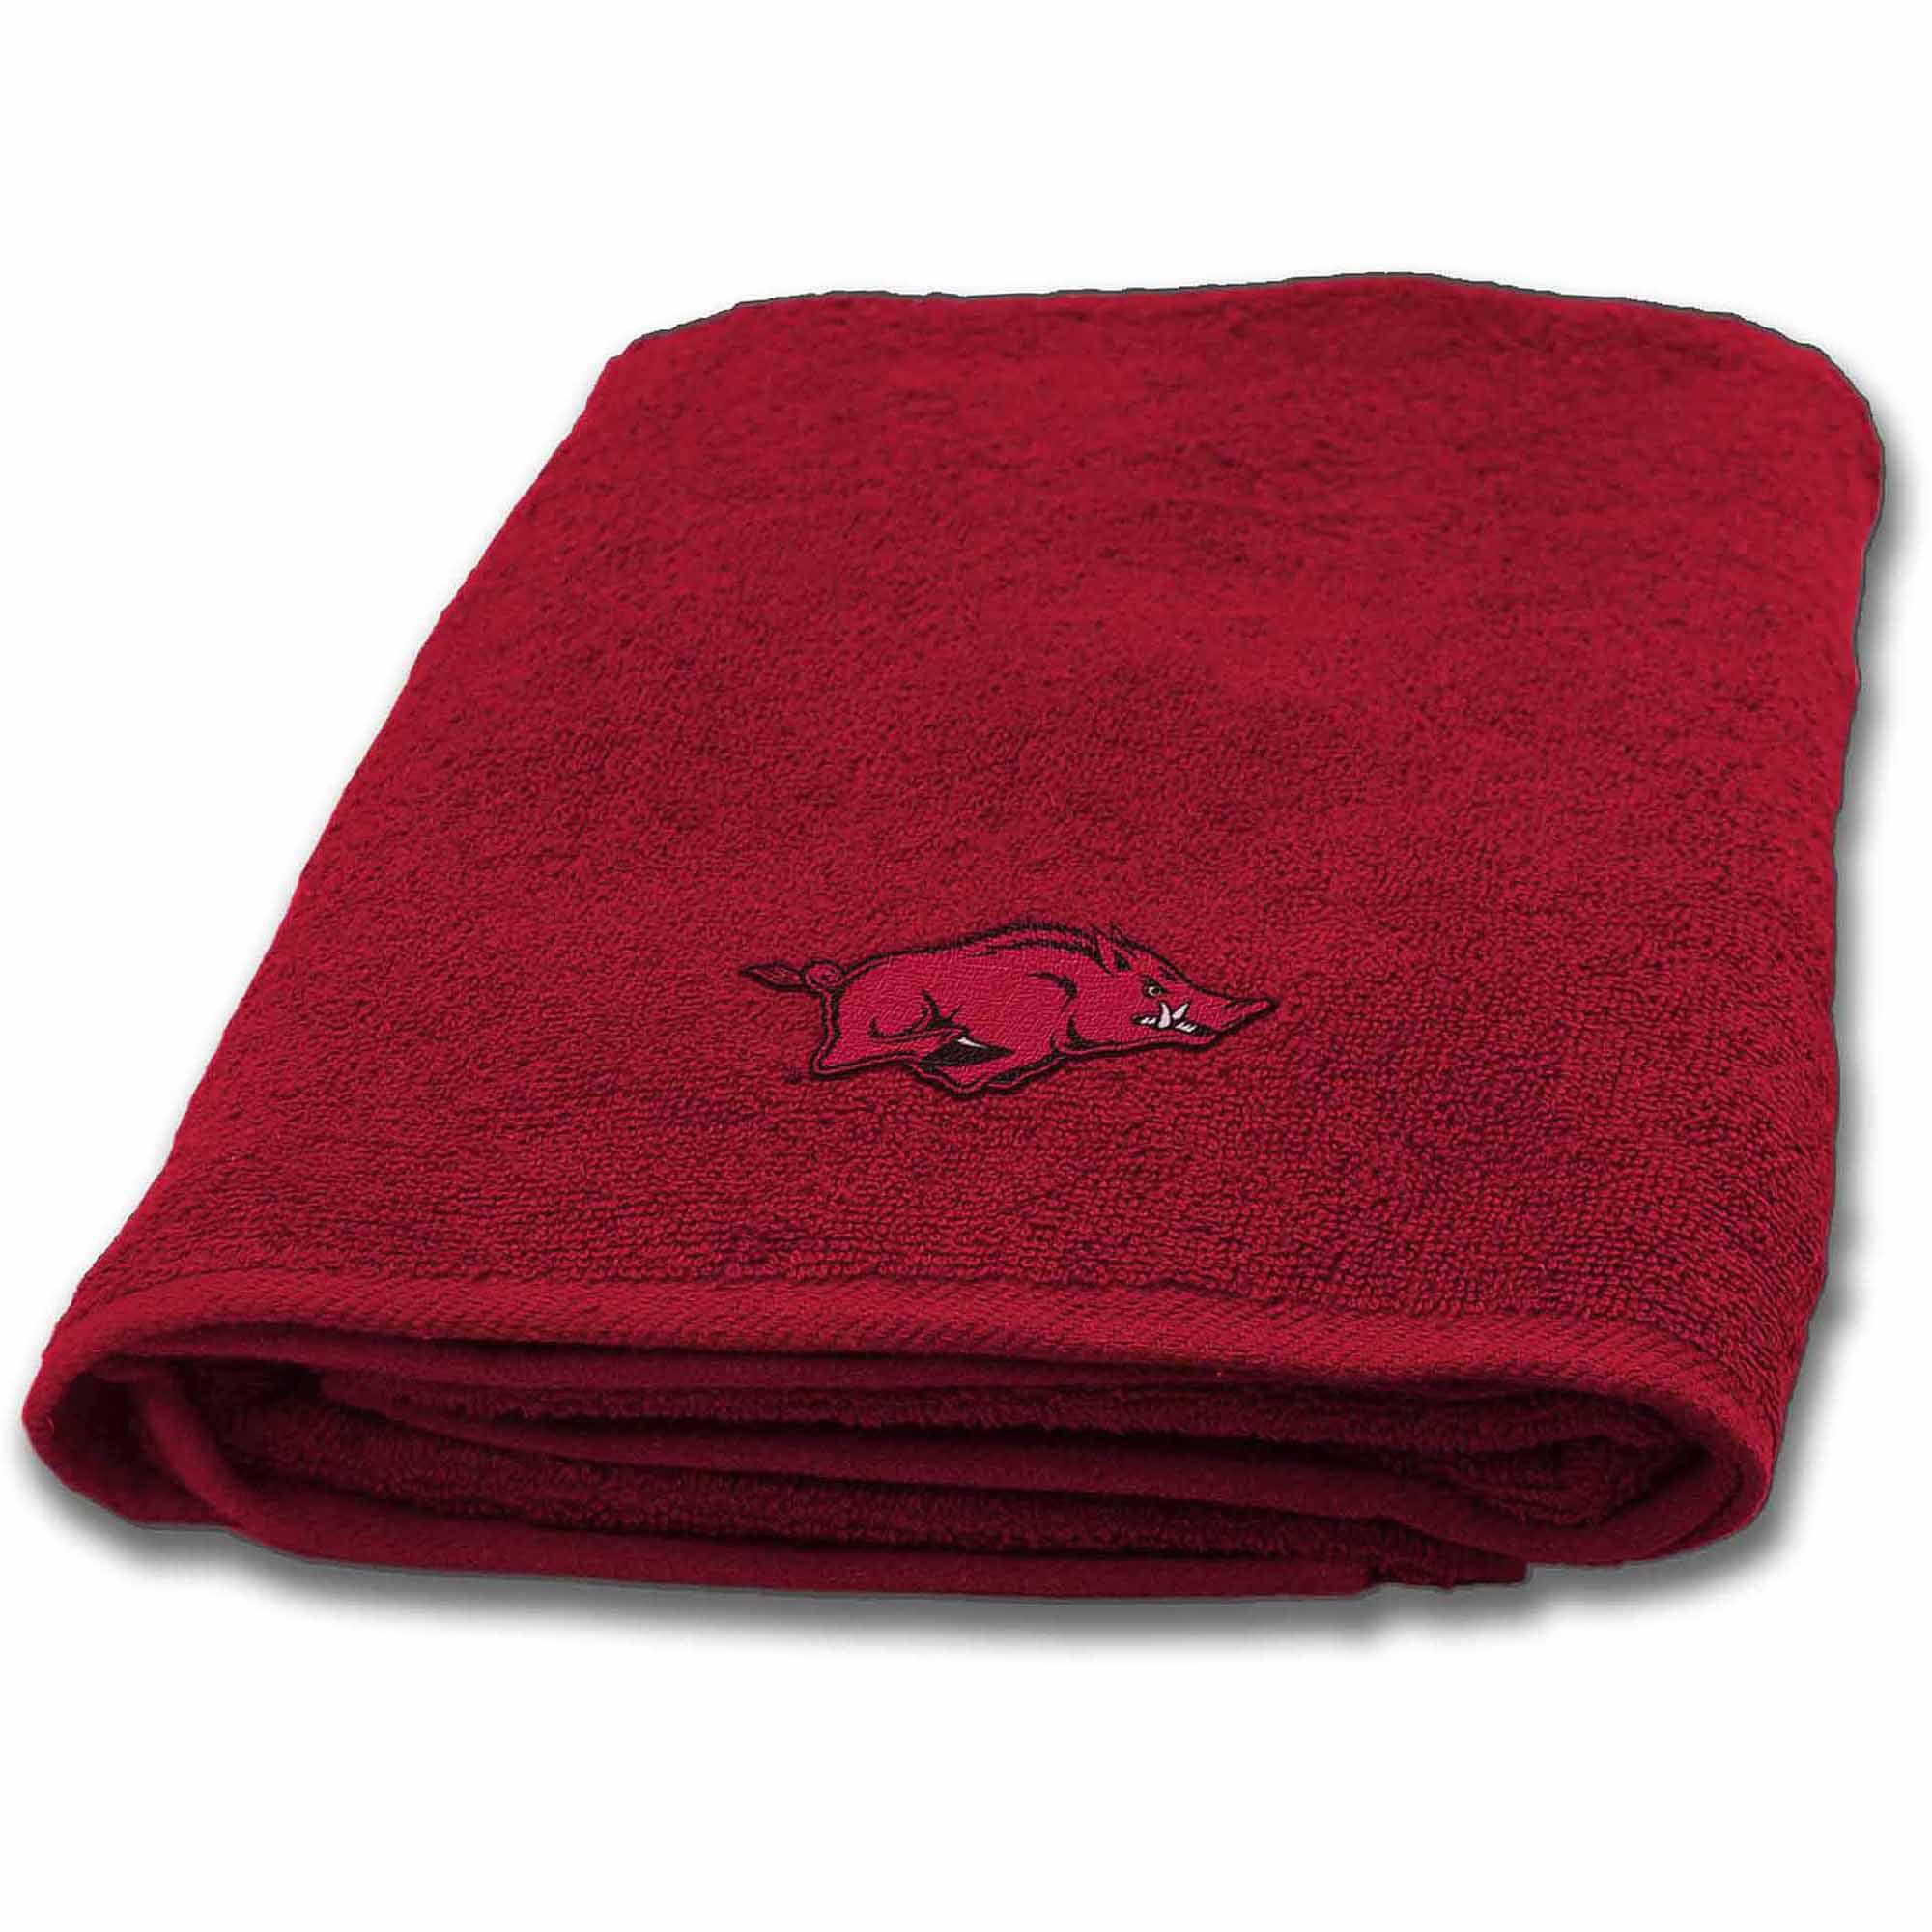 NCAA University of Arkansas Decorative Bath Collection - Bath Towel